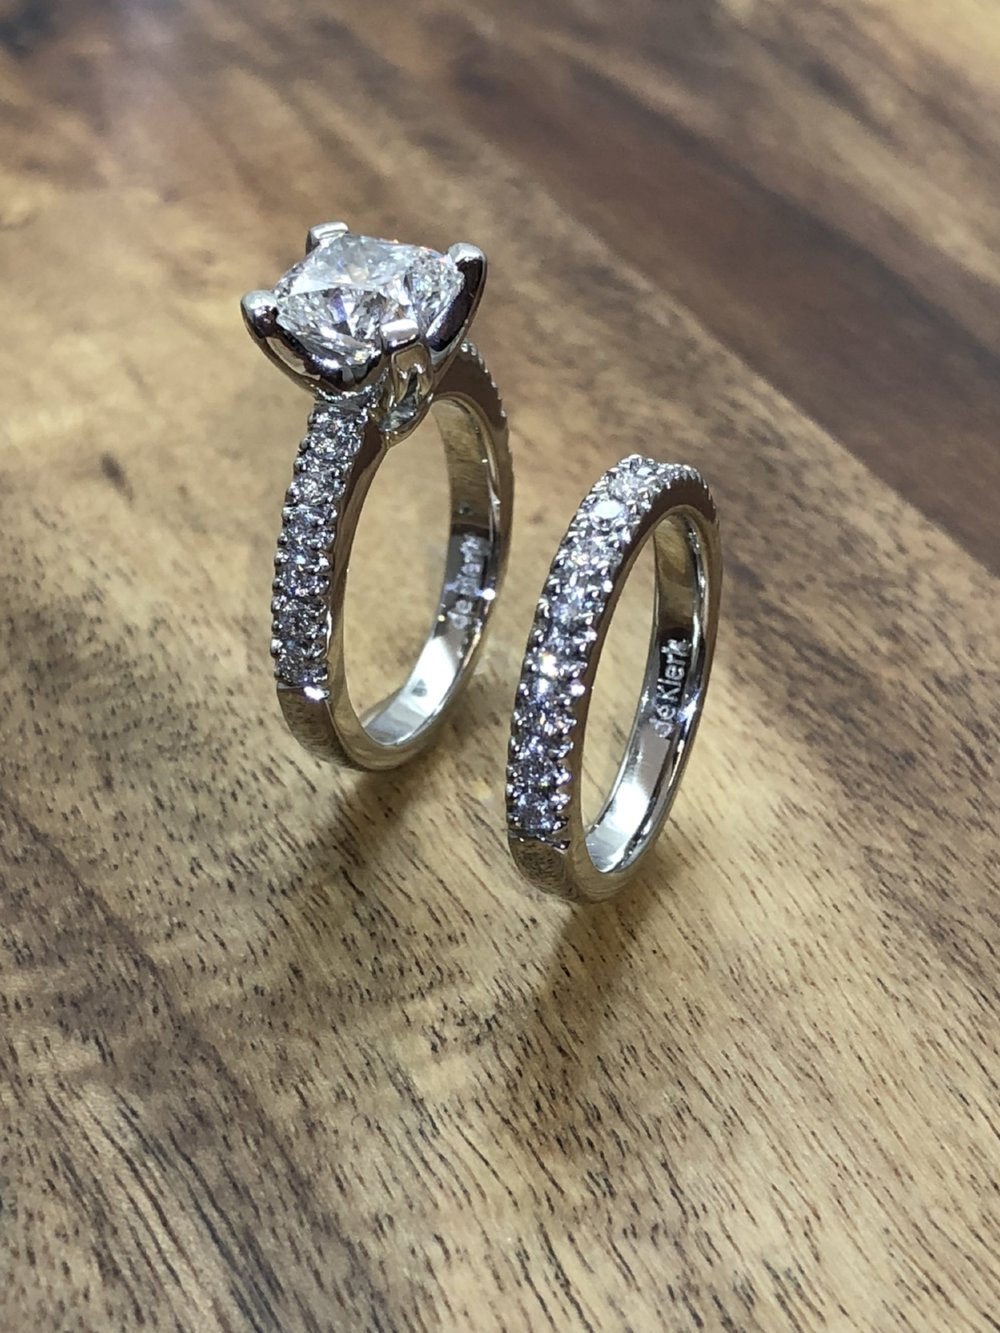 Engagement Ring Matching Diamond Wedding Band